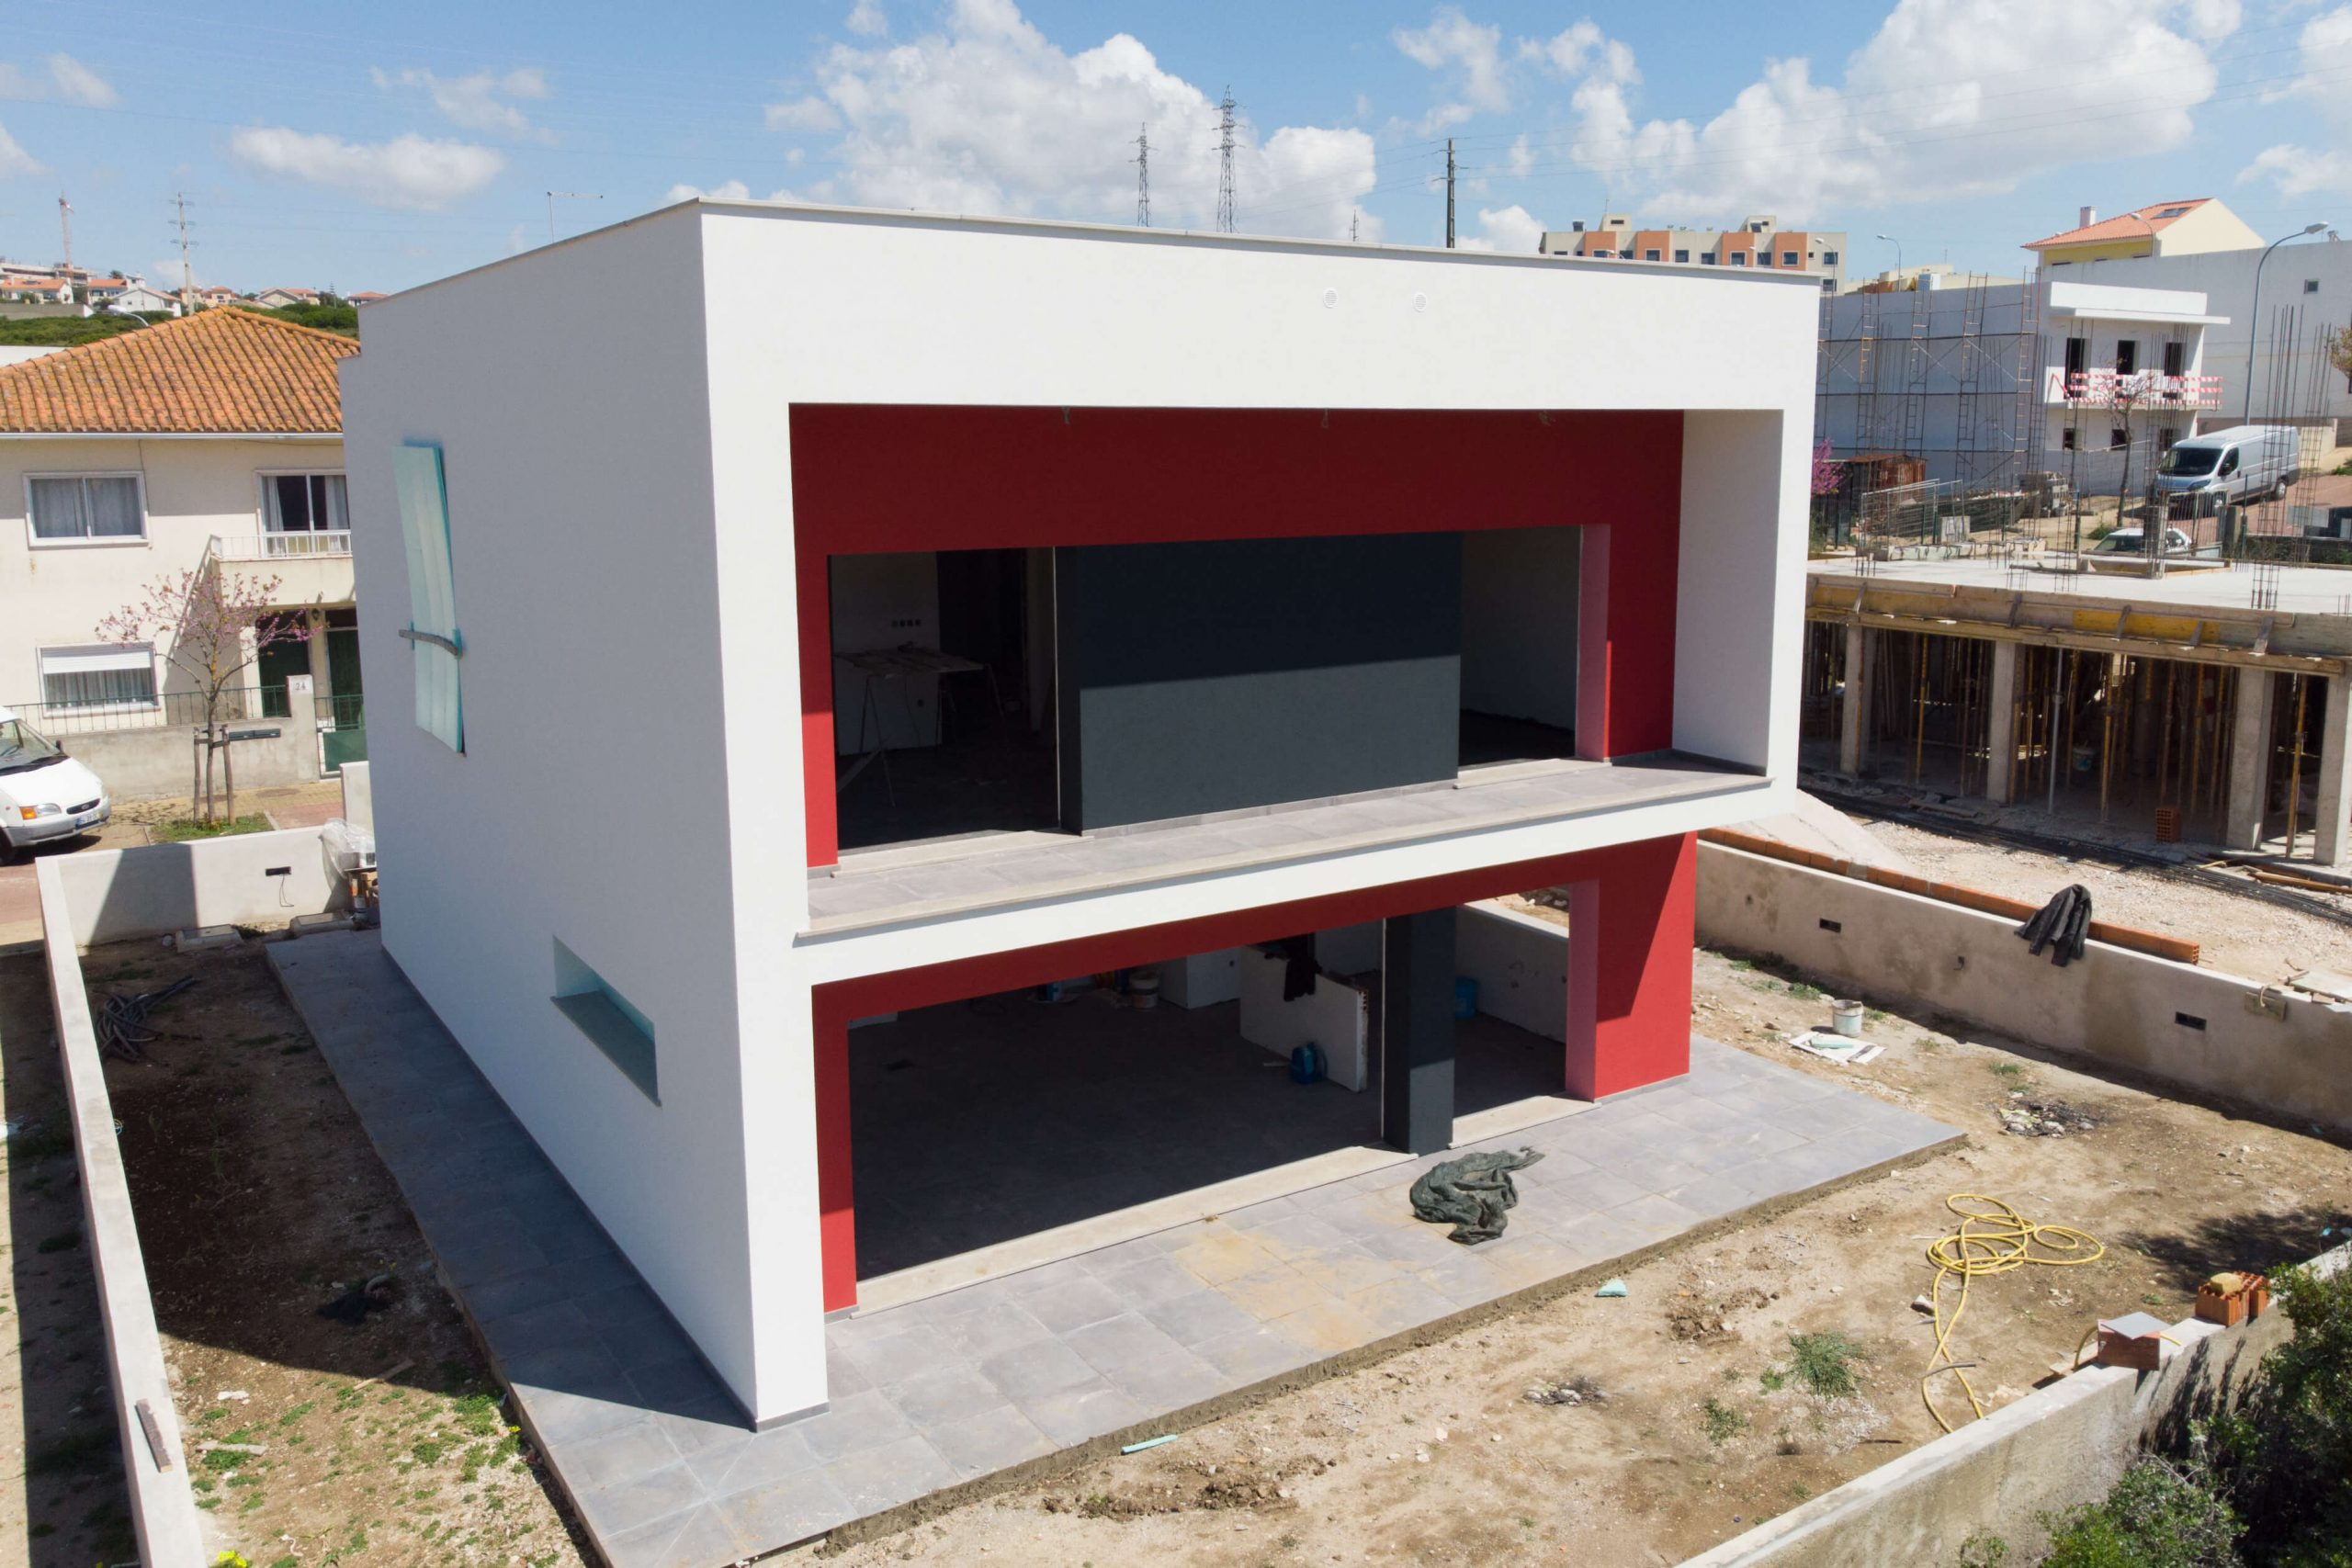 Moradia 5 Talaide - DJI_0200 - Está Capoto